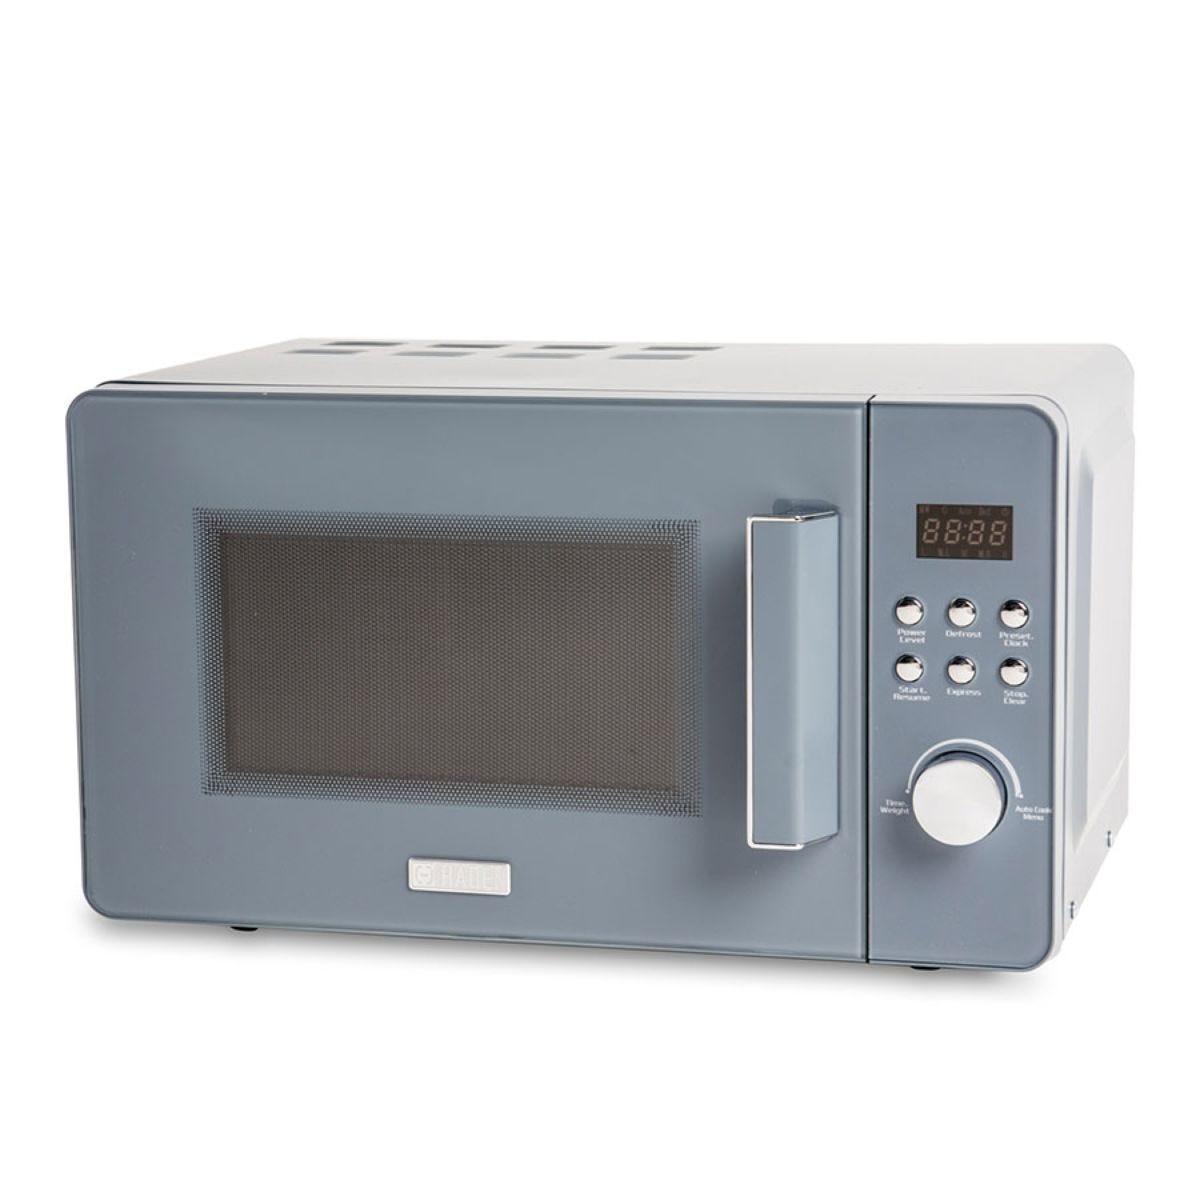 Haden 186690 Perth Sleek 800W 20L Manual Microwave – Slate Grey